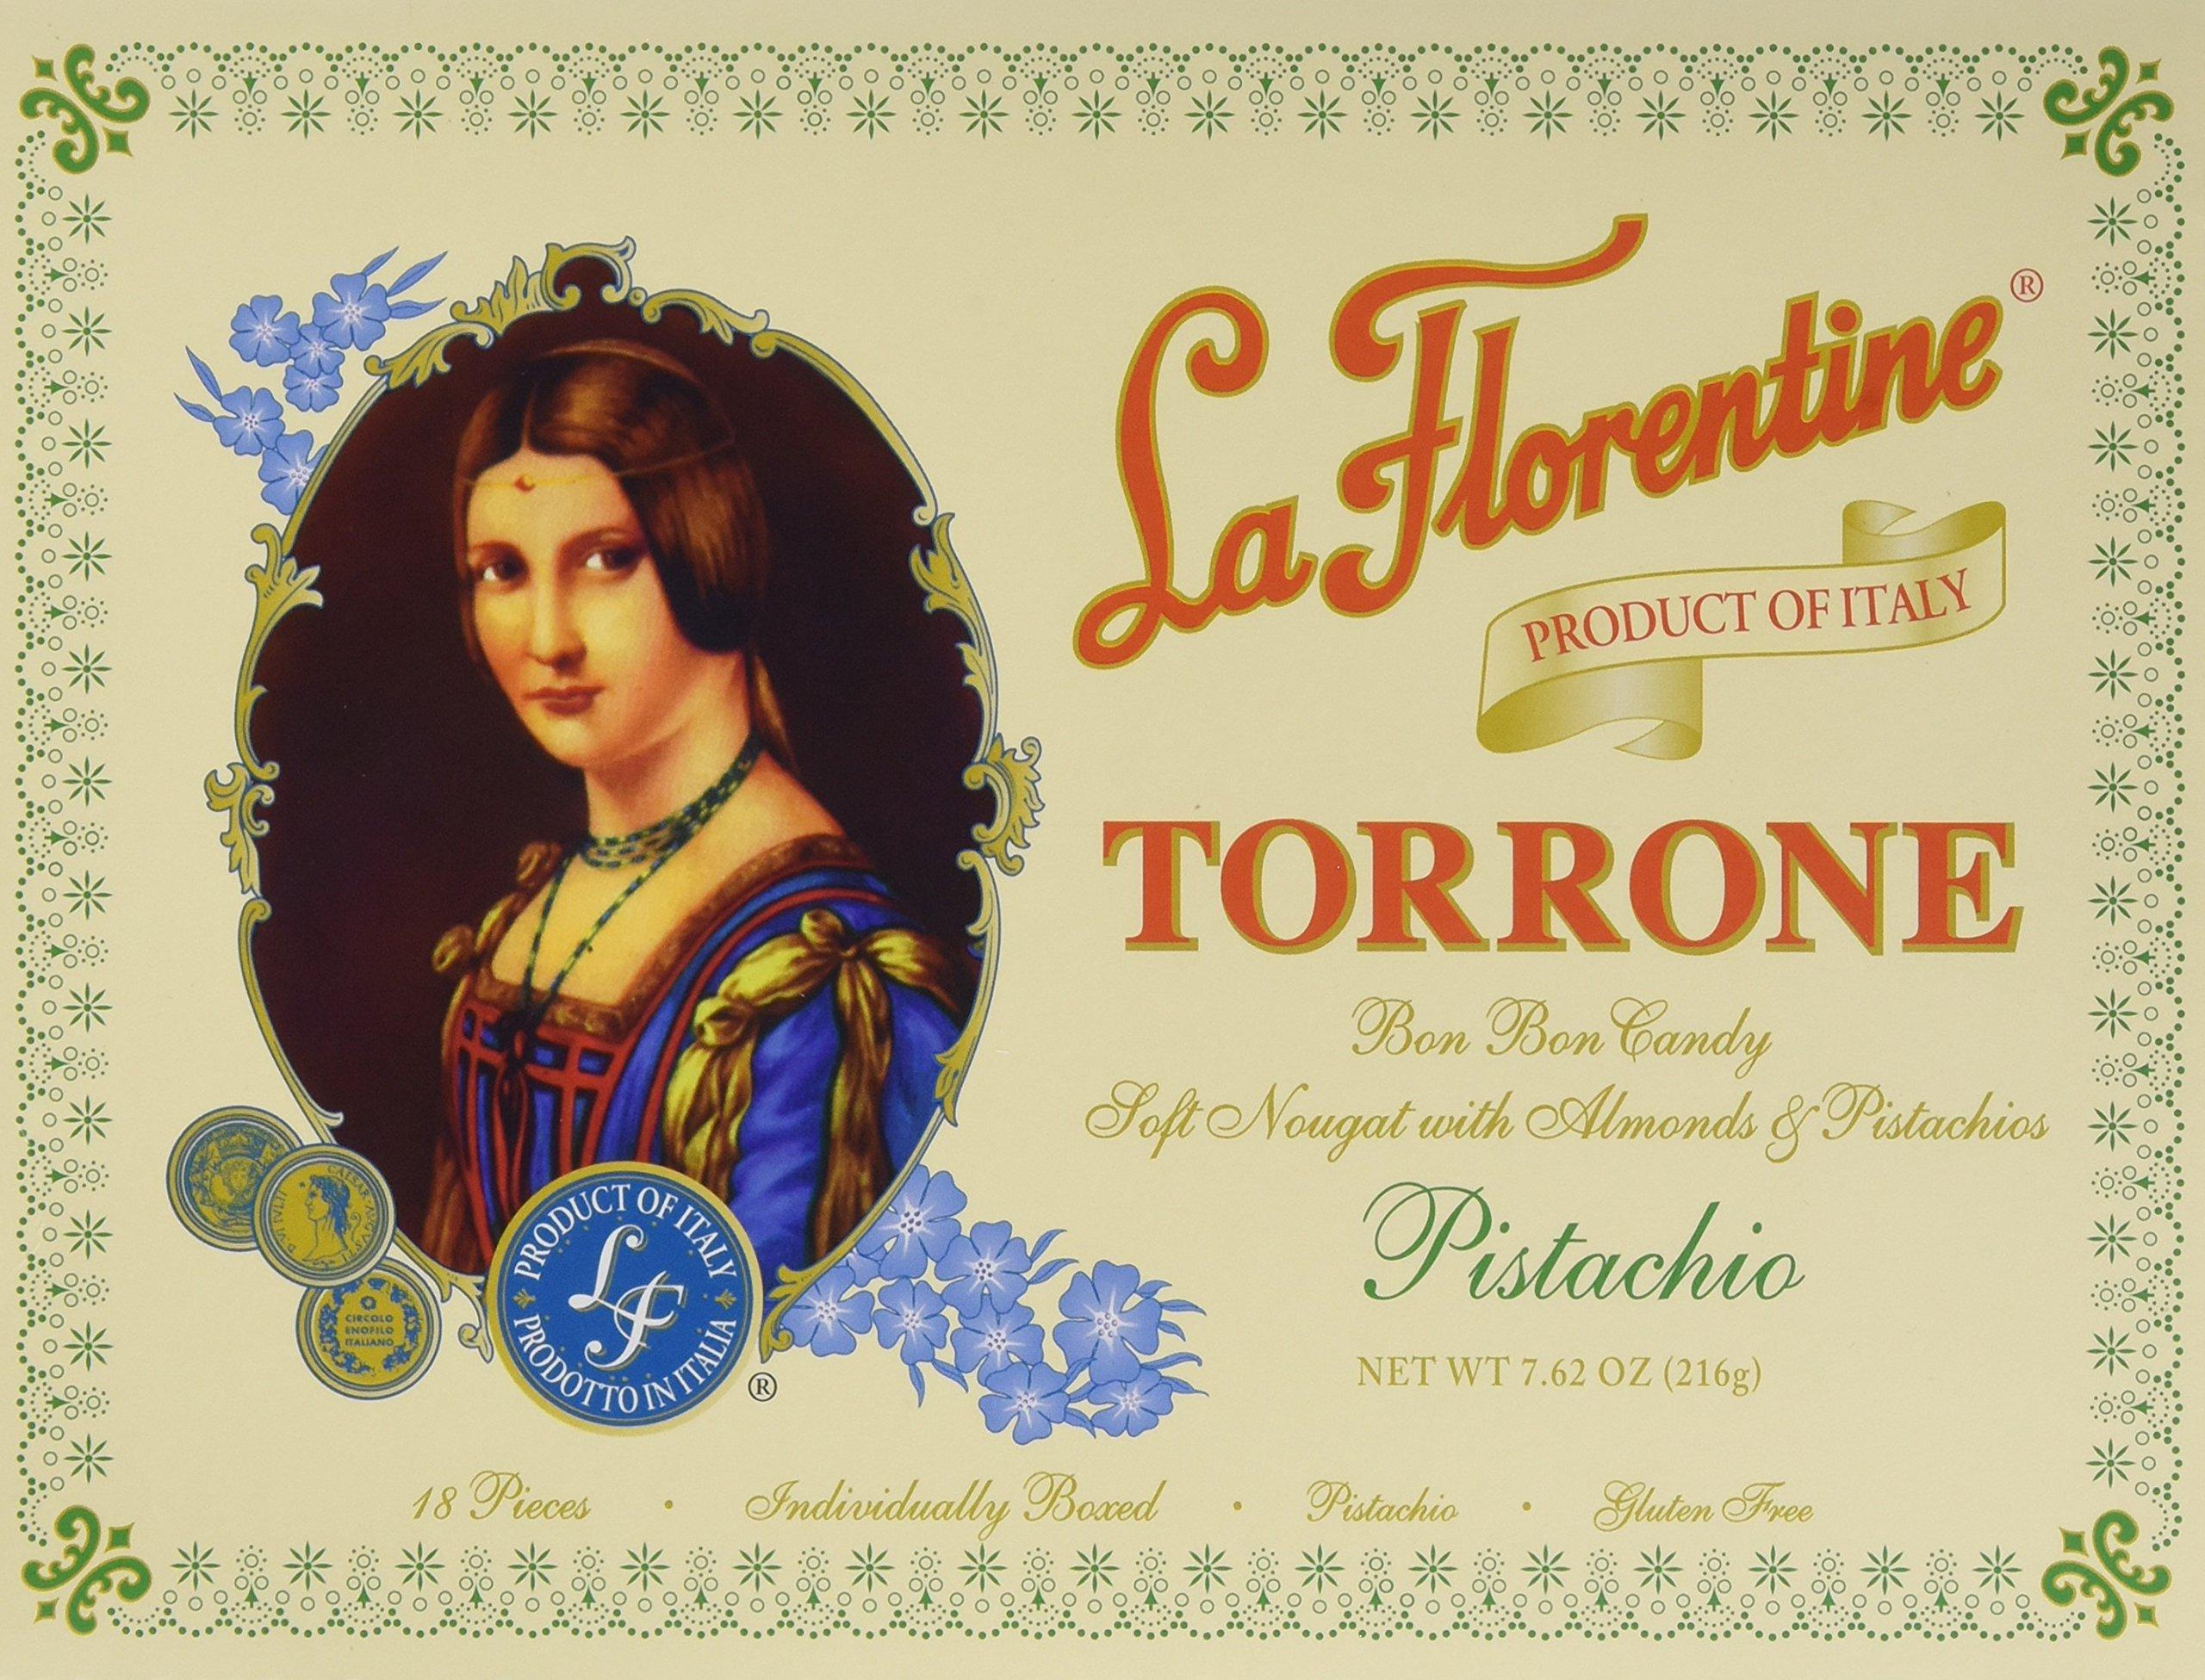 La Florentine Pistachio Torrone, 7.62 Ounce by La Florentine